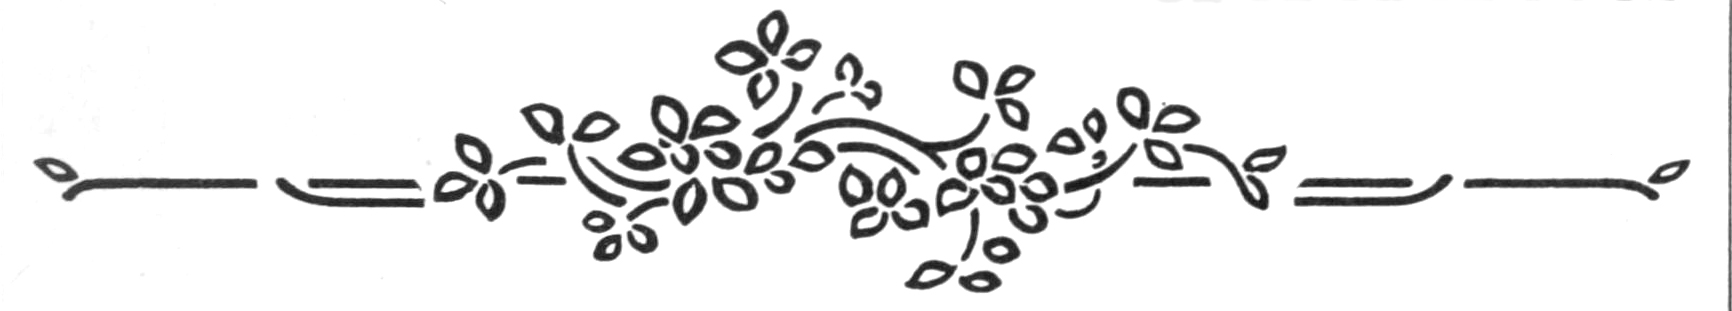 motiftypo-horizontal03